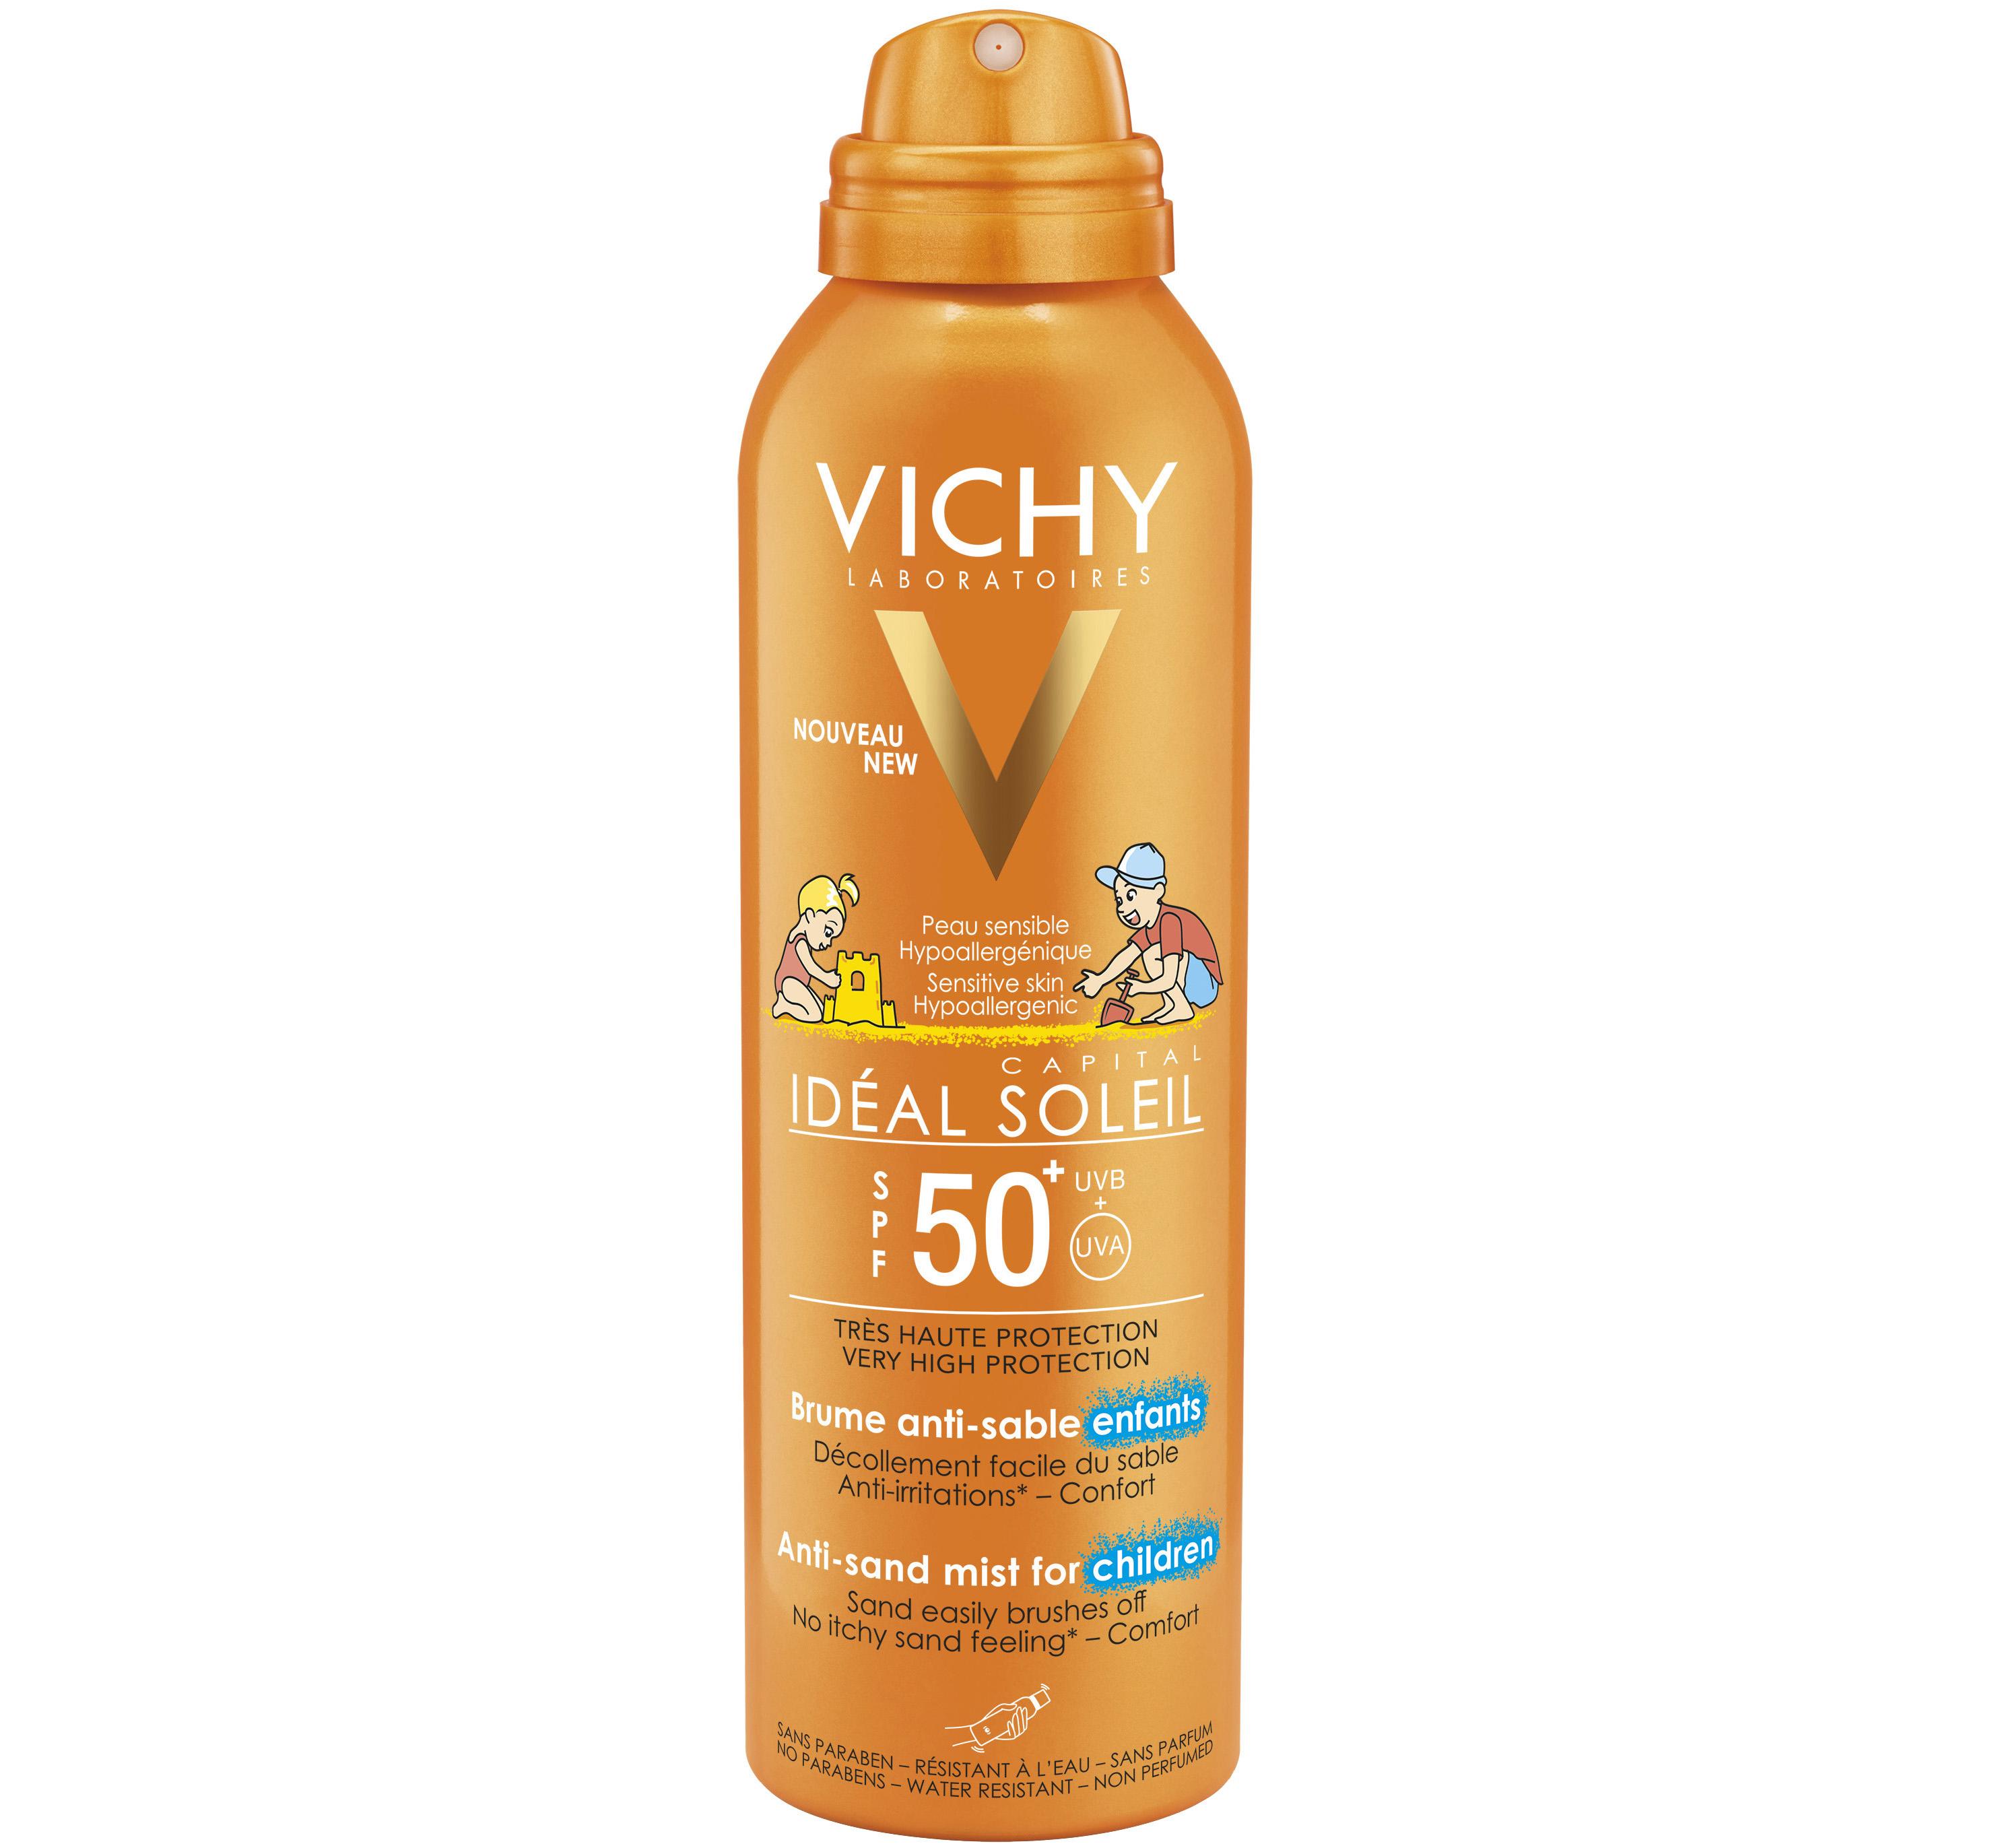 Vichy Ideal Soleil Αντηλιακό Παιδικό Spray που Απομακρύνει την Άμμο Spf50 200ml